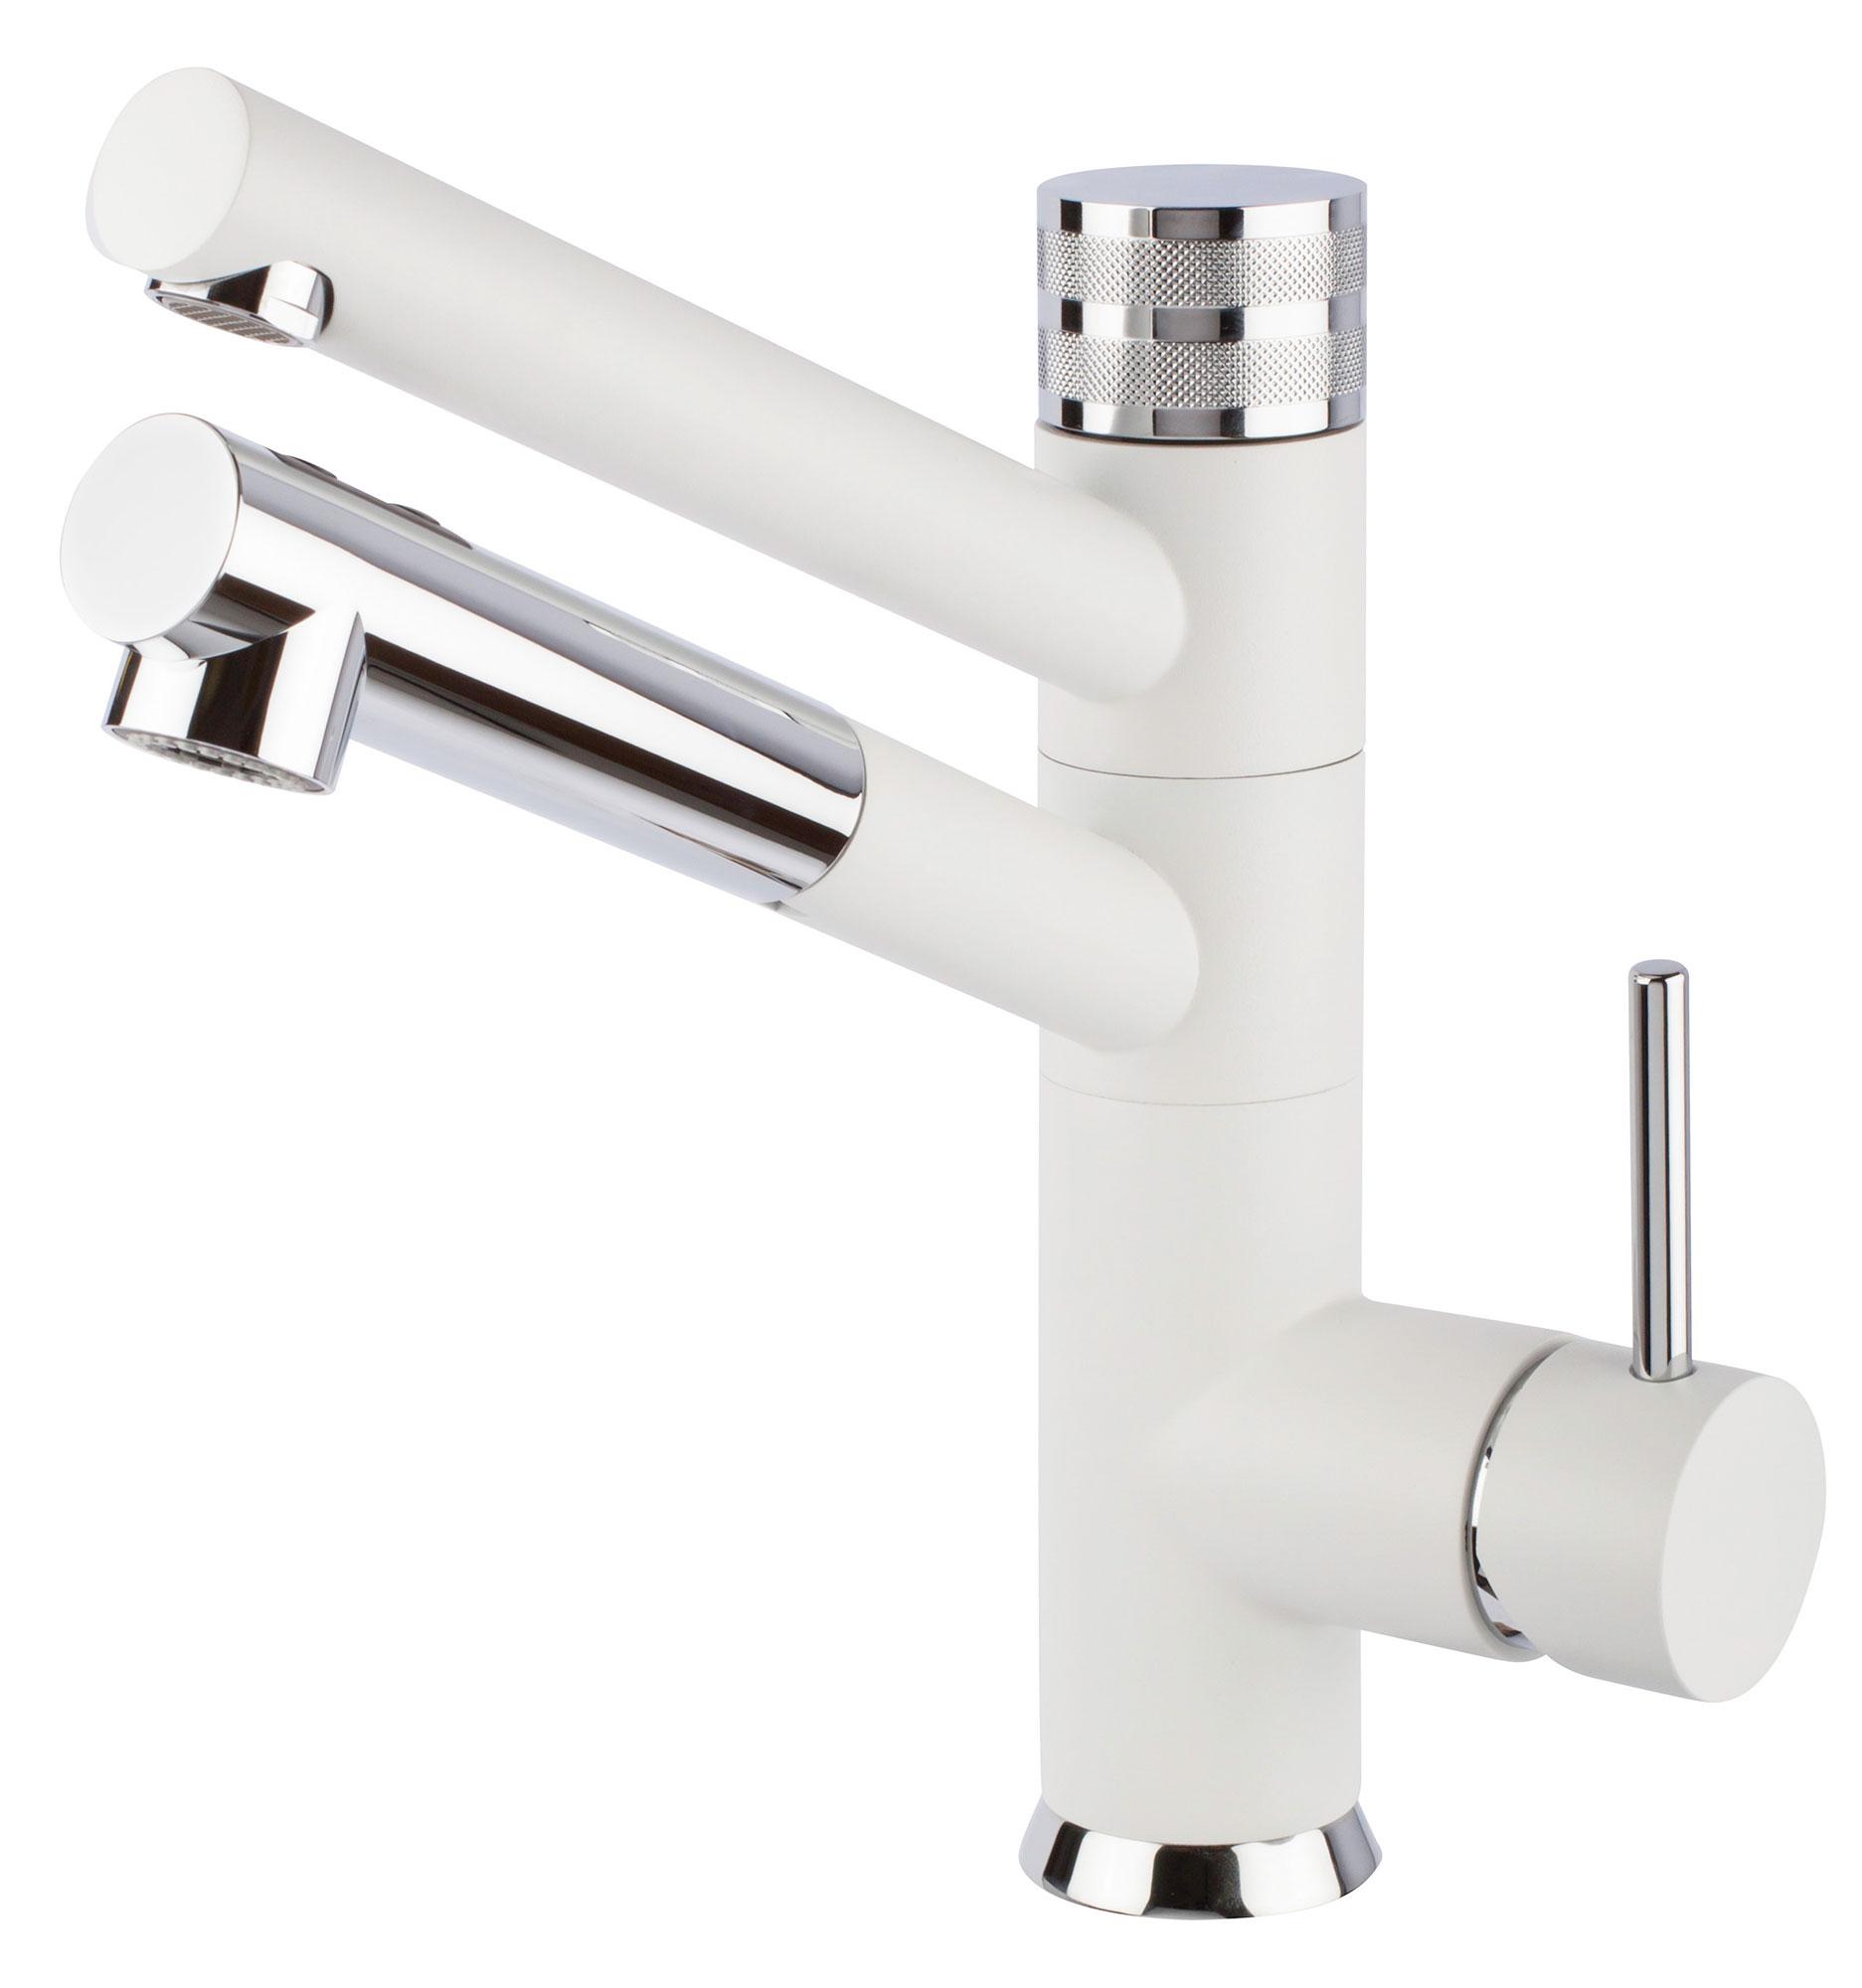 Hommix 3 way facuet friflow sicilia pull out spray white kitchen mixer zelal water